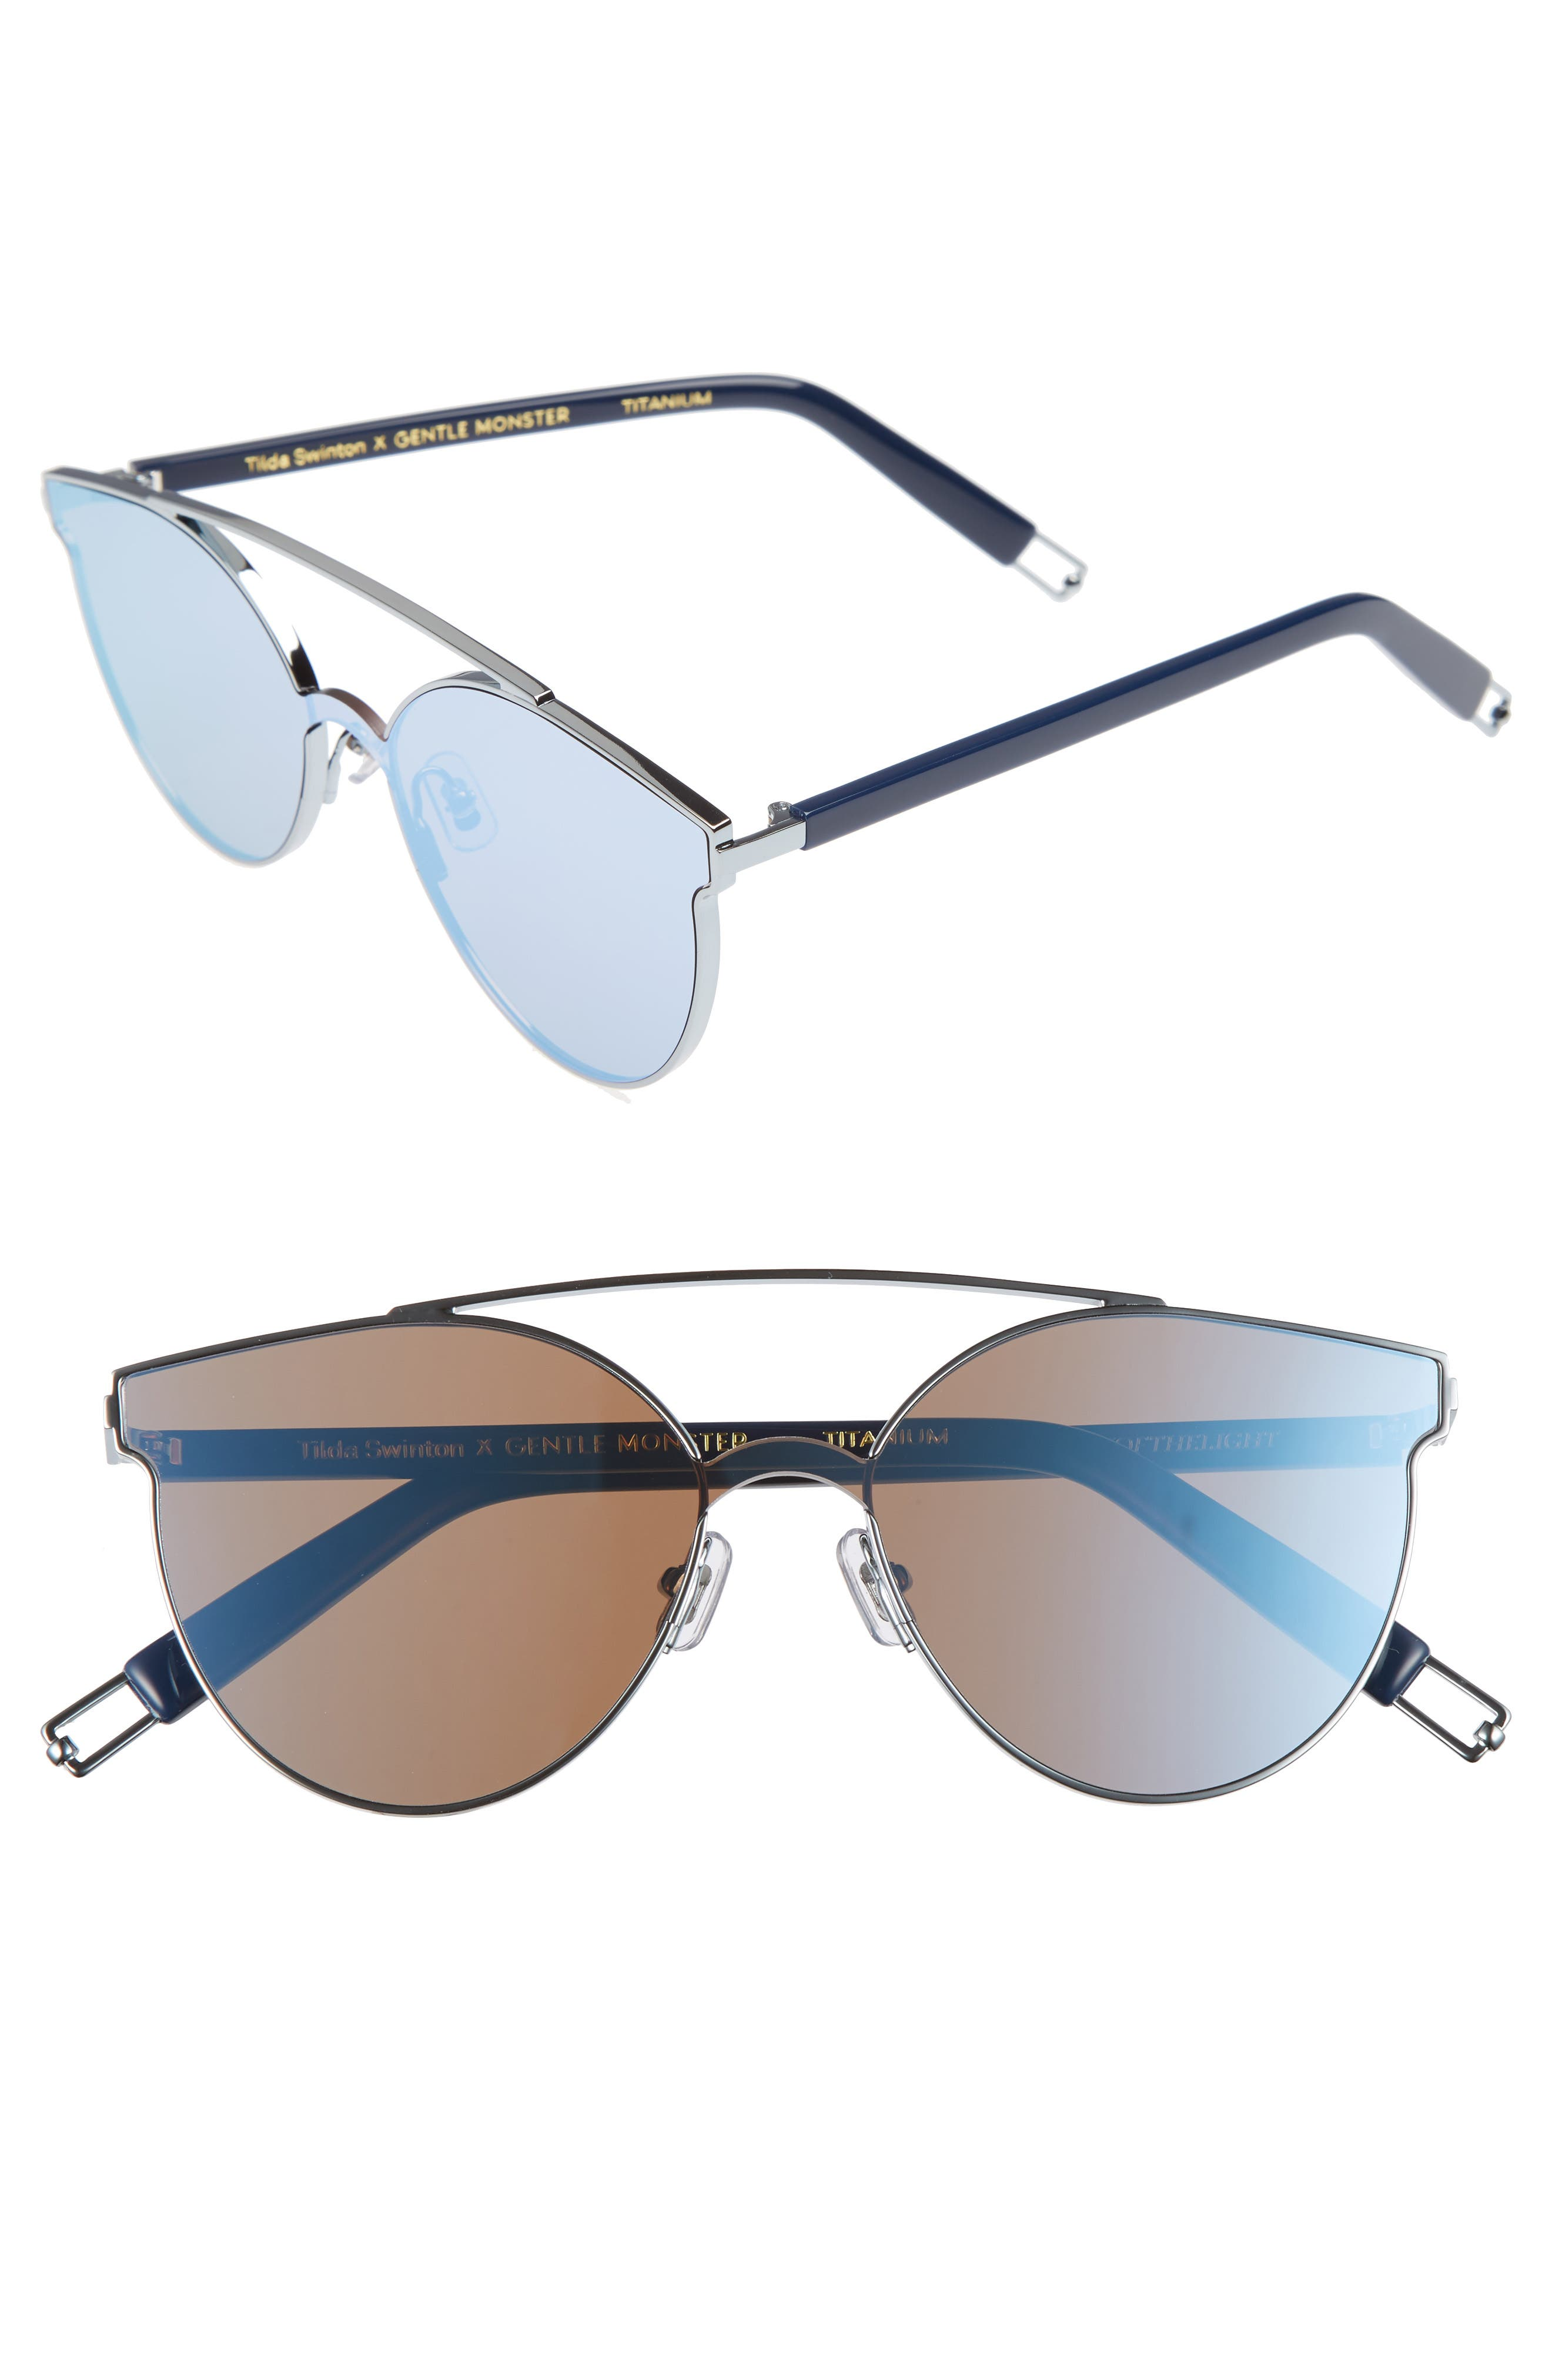 Tilda Swinton x Gentle Monster Trick of the Light 60mm Shield Sunglasses,                             Main thumbnail 1, color,                             Blue Mirror